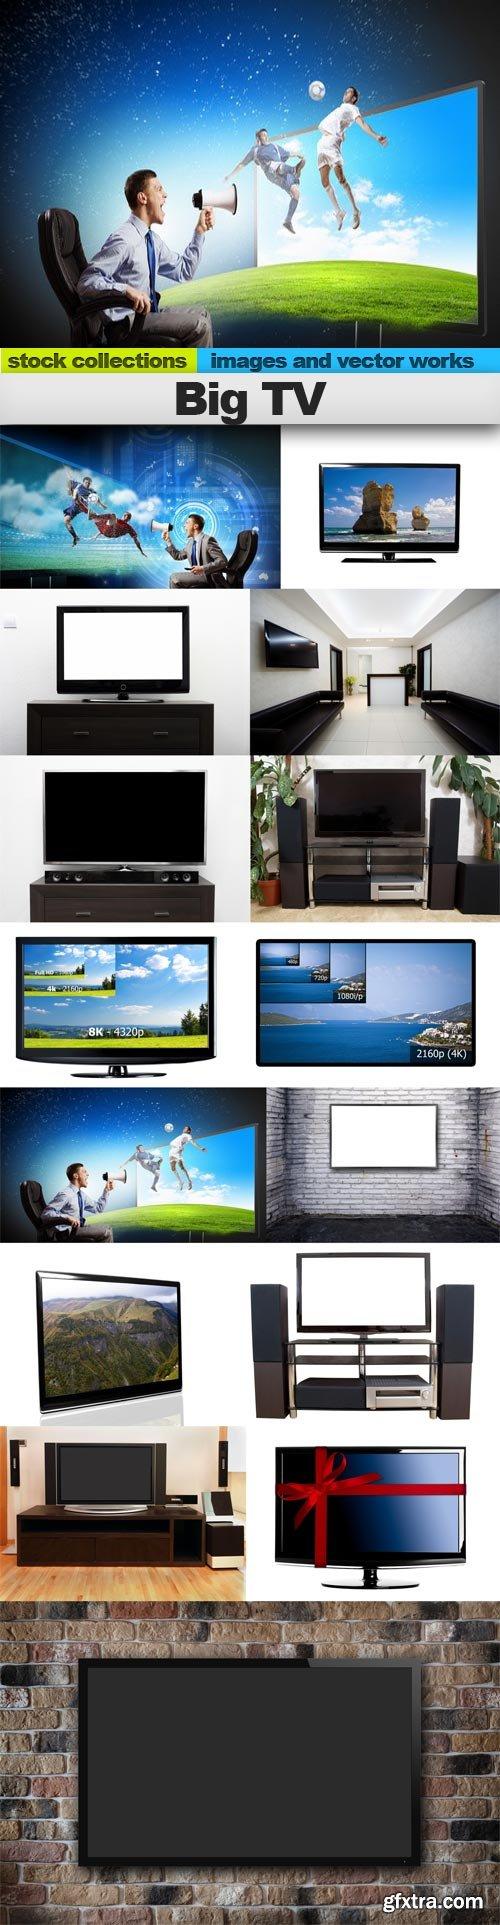 Big TV, 15 x UHQ JPEG